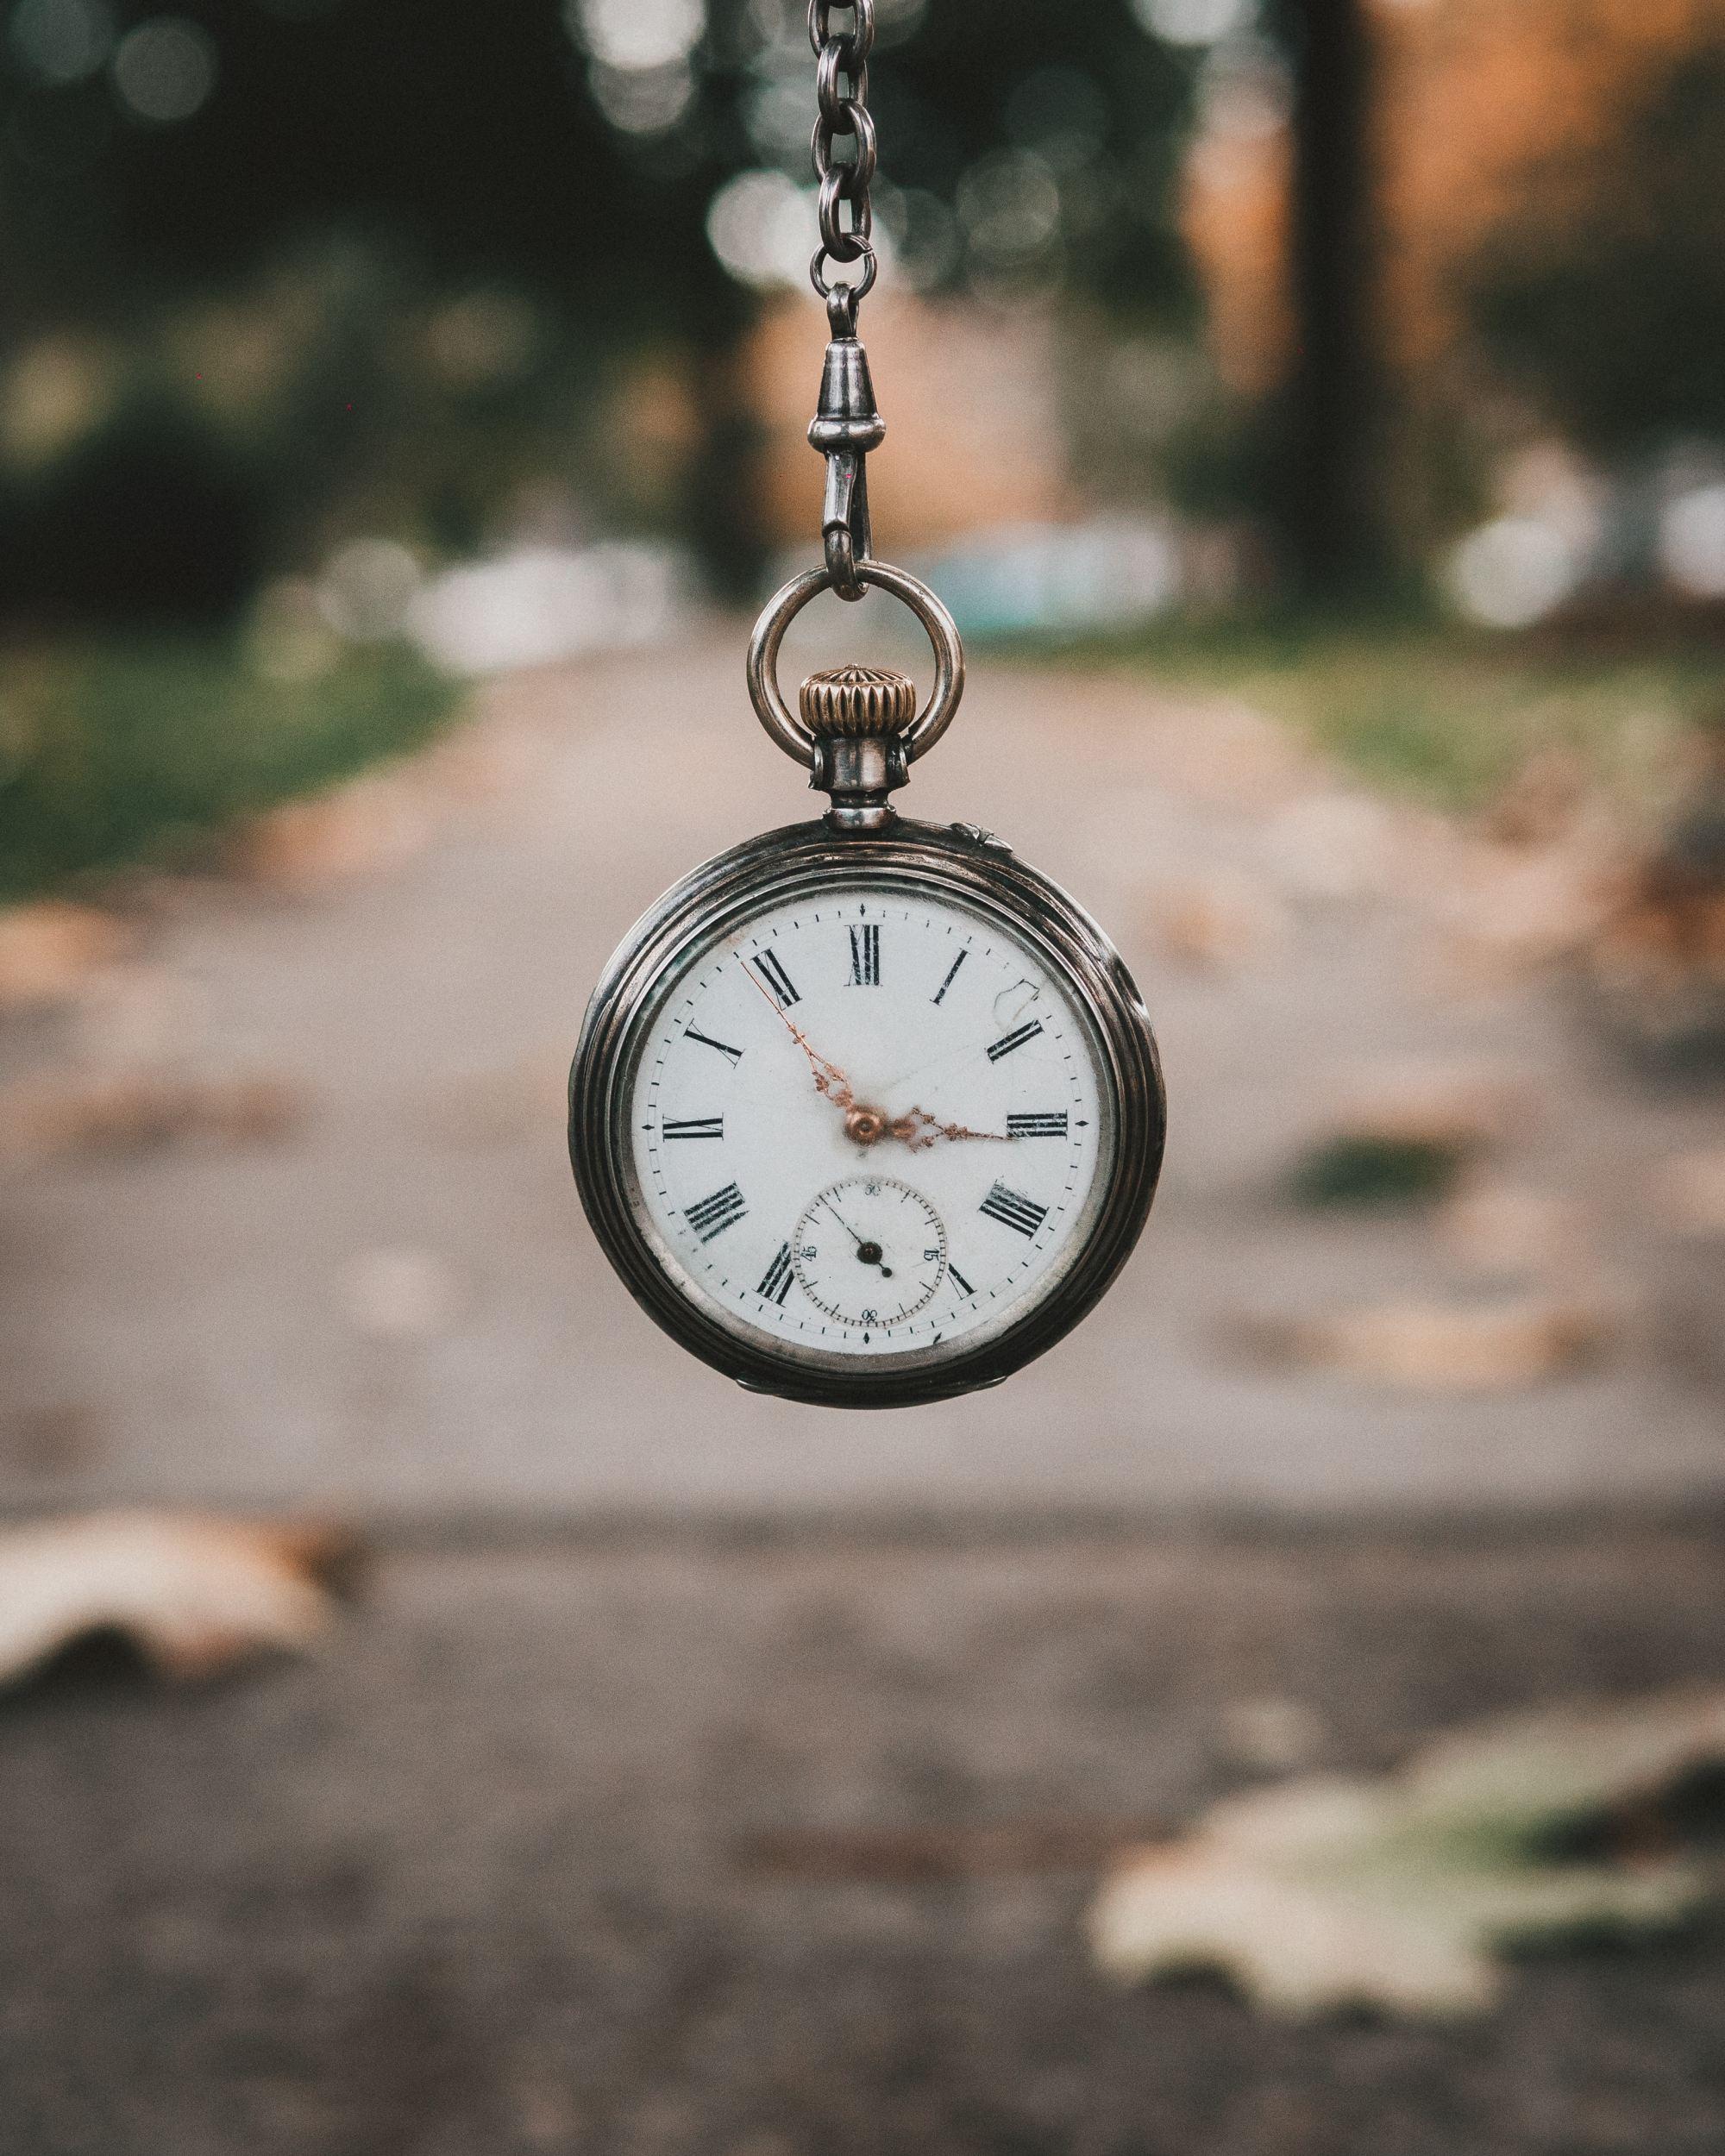 Time zones in MS Flow